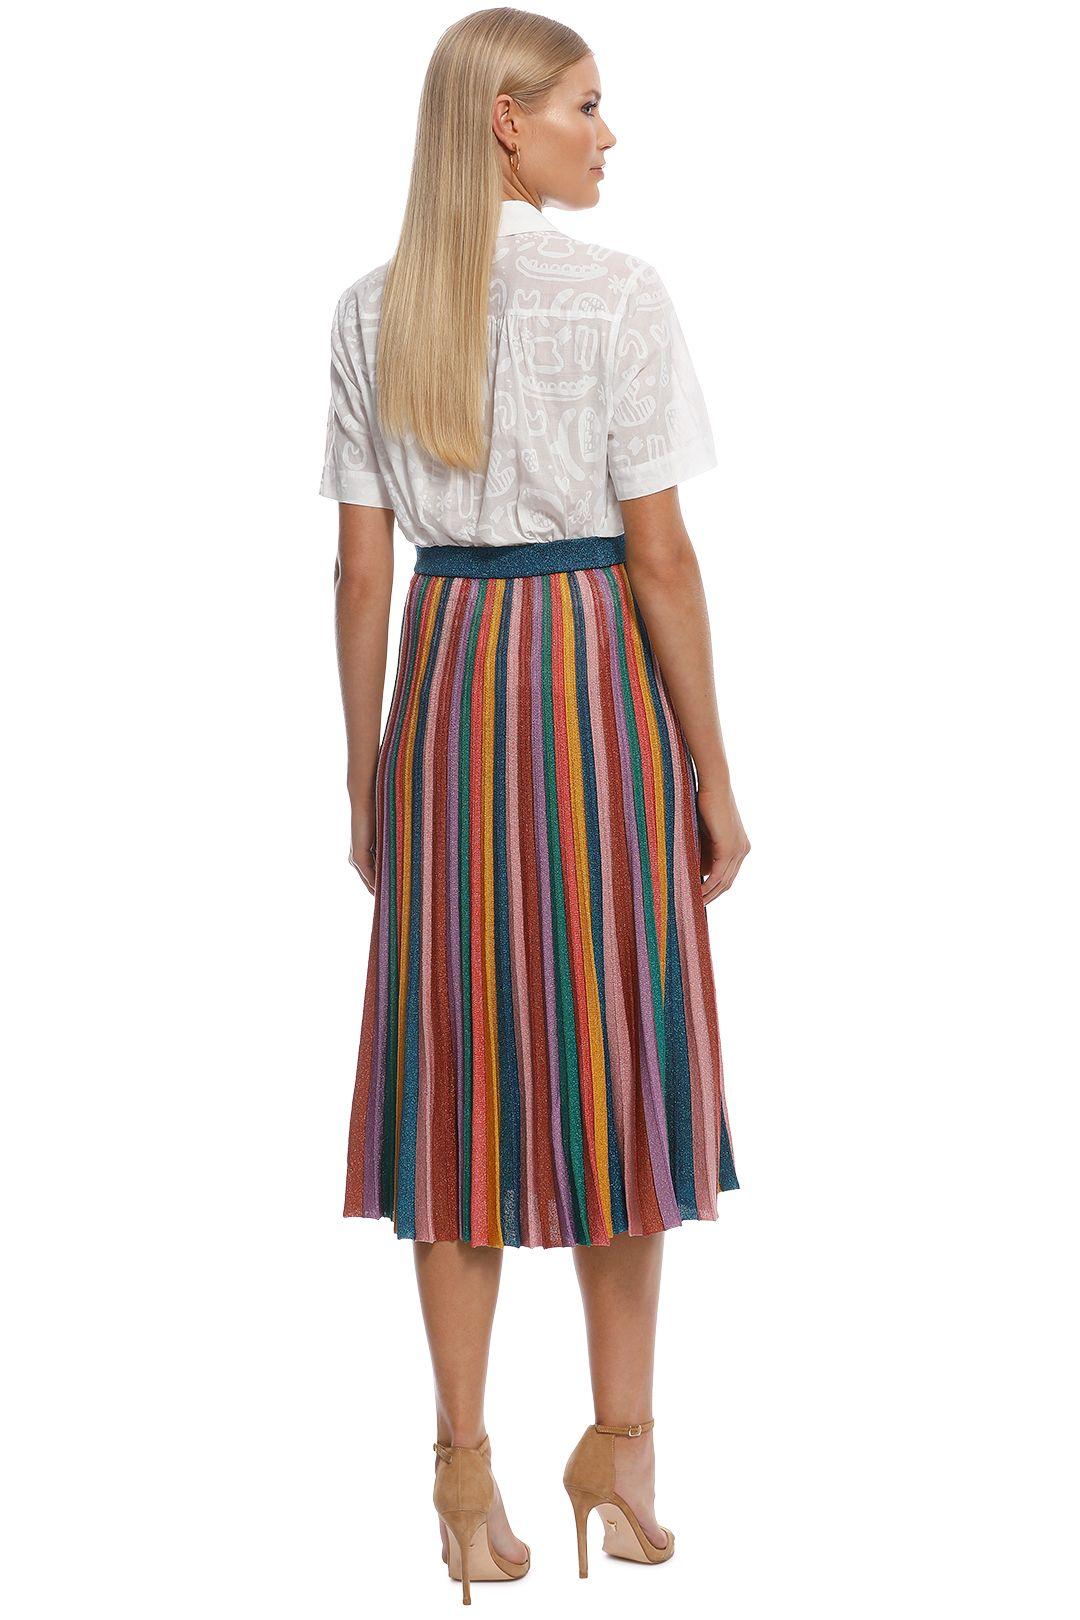 Gorman - Rainbow Knit Skirt - Multi - Back